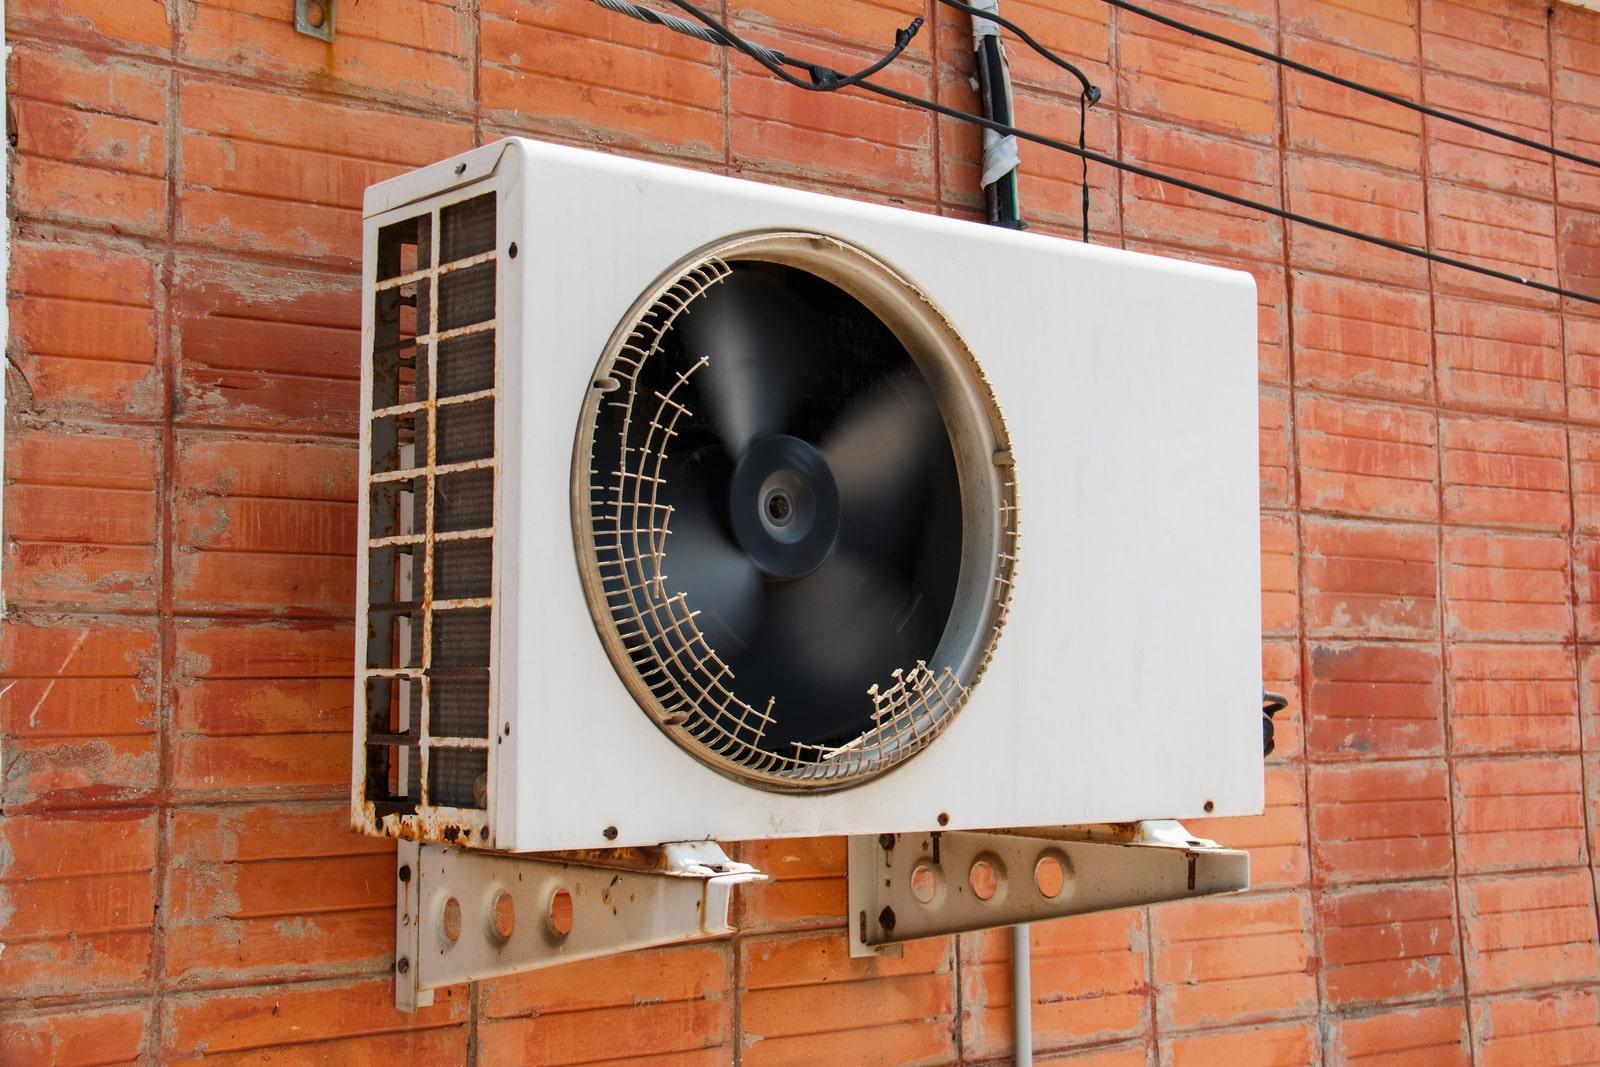 old compressor air-conditioner